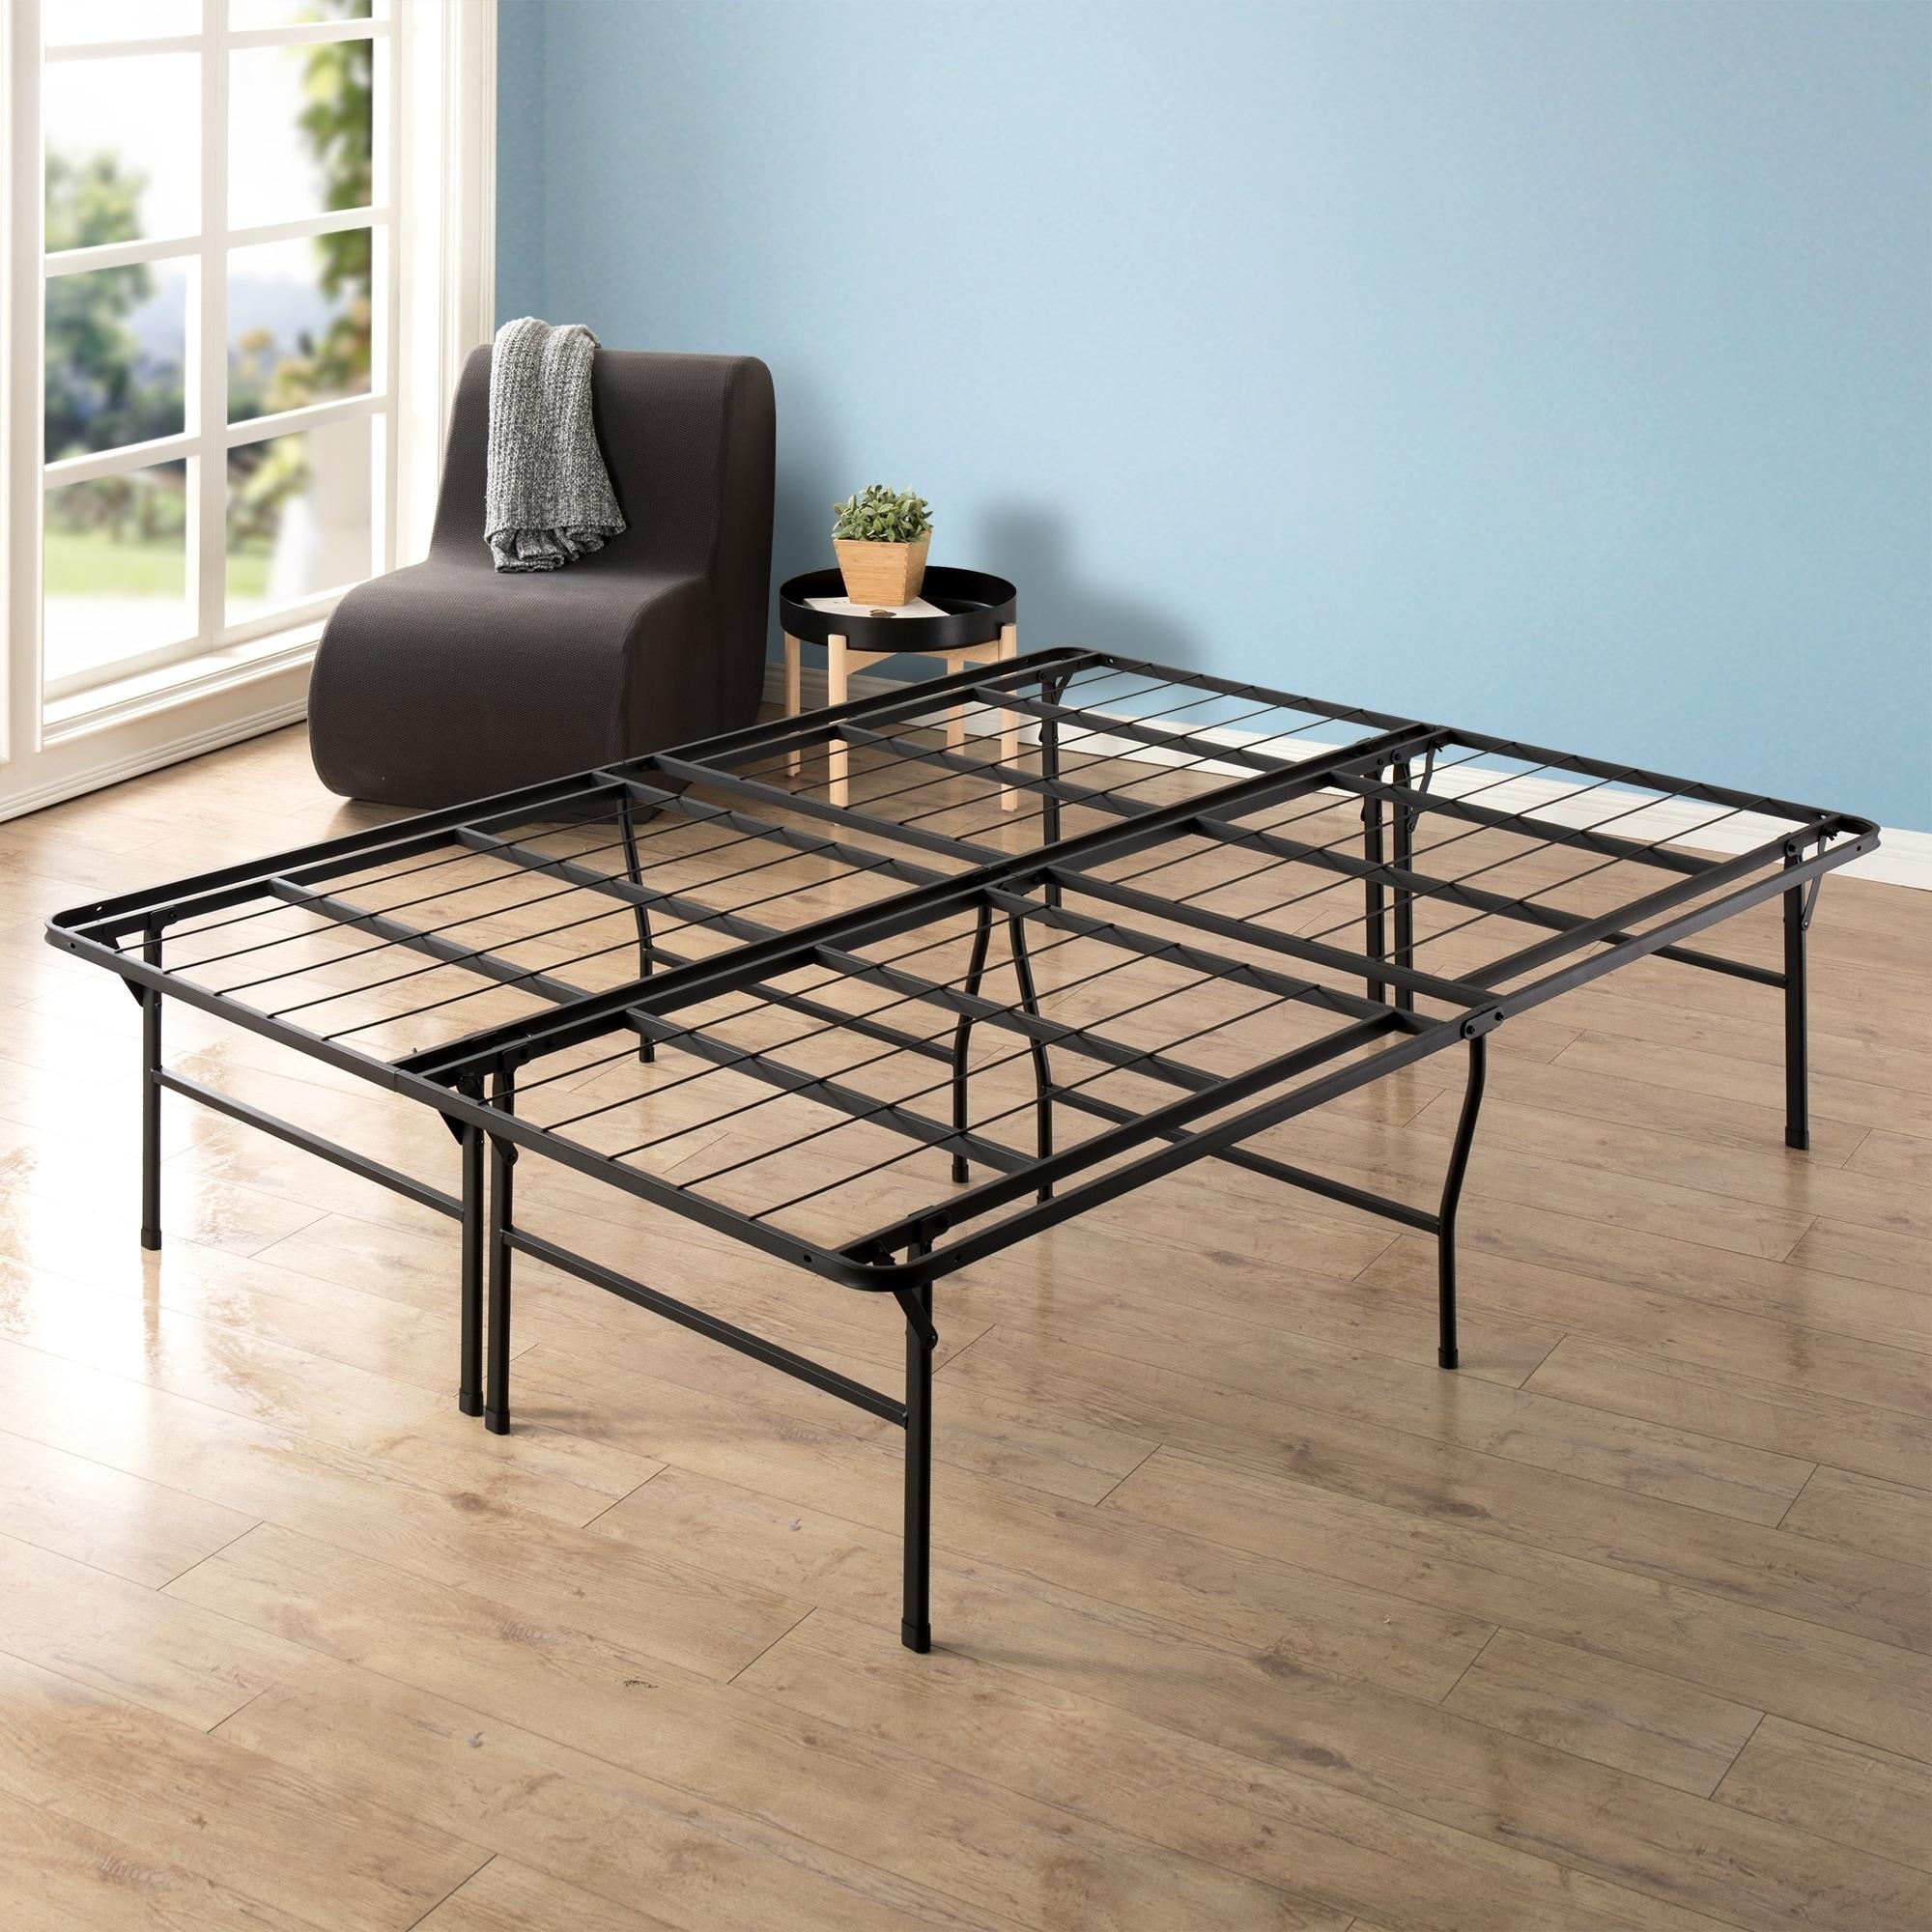 California King Size 18 Inch Metal Platform Bed Frame Crown Comfort On Sale Overstock 21474546